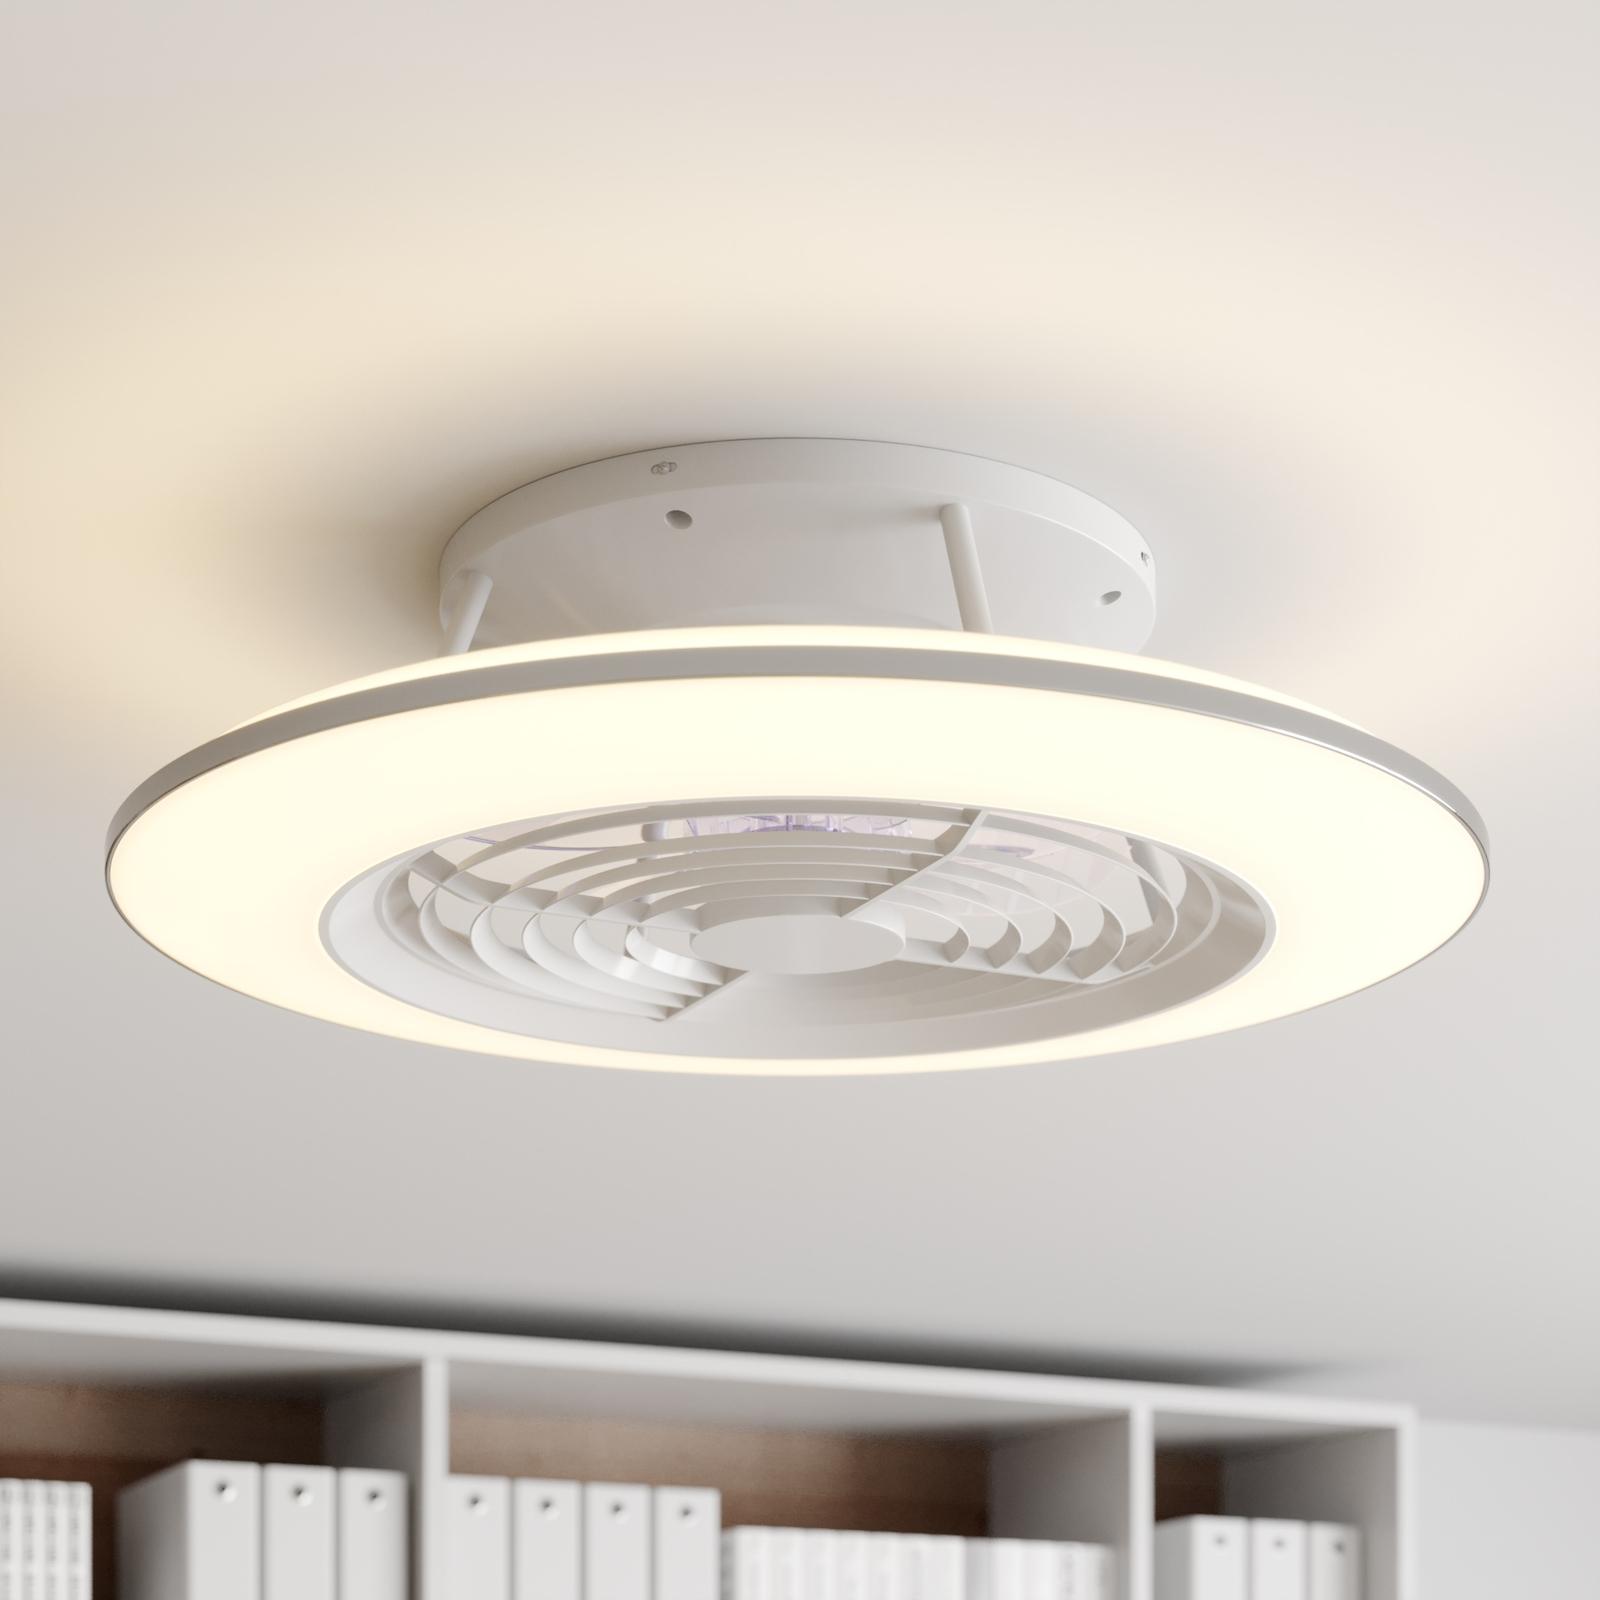 Arcchio Fenio LED plafondventilator, wit